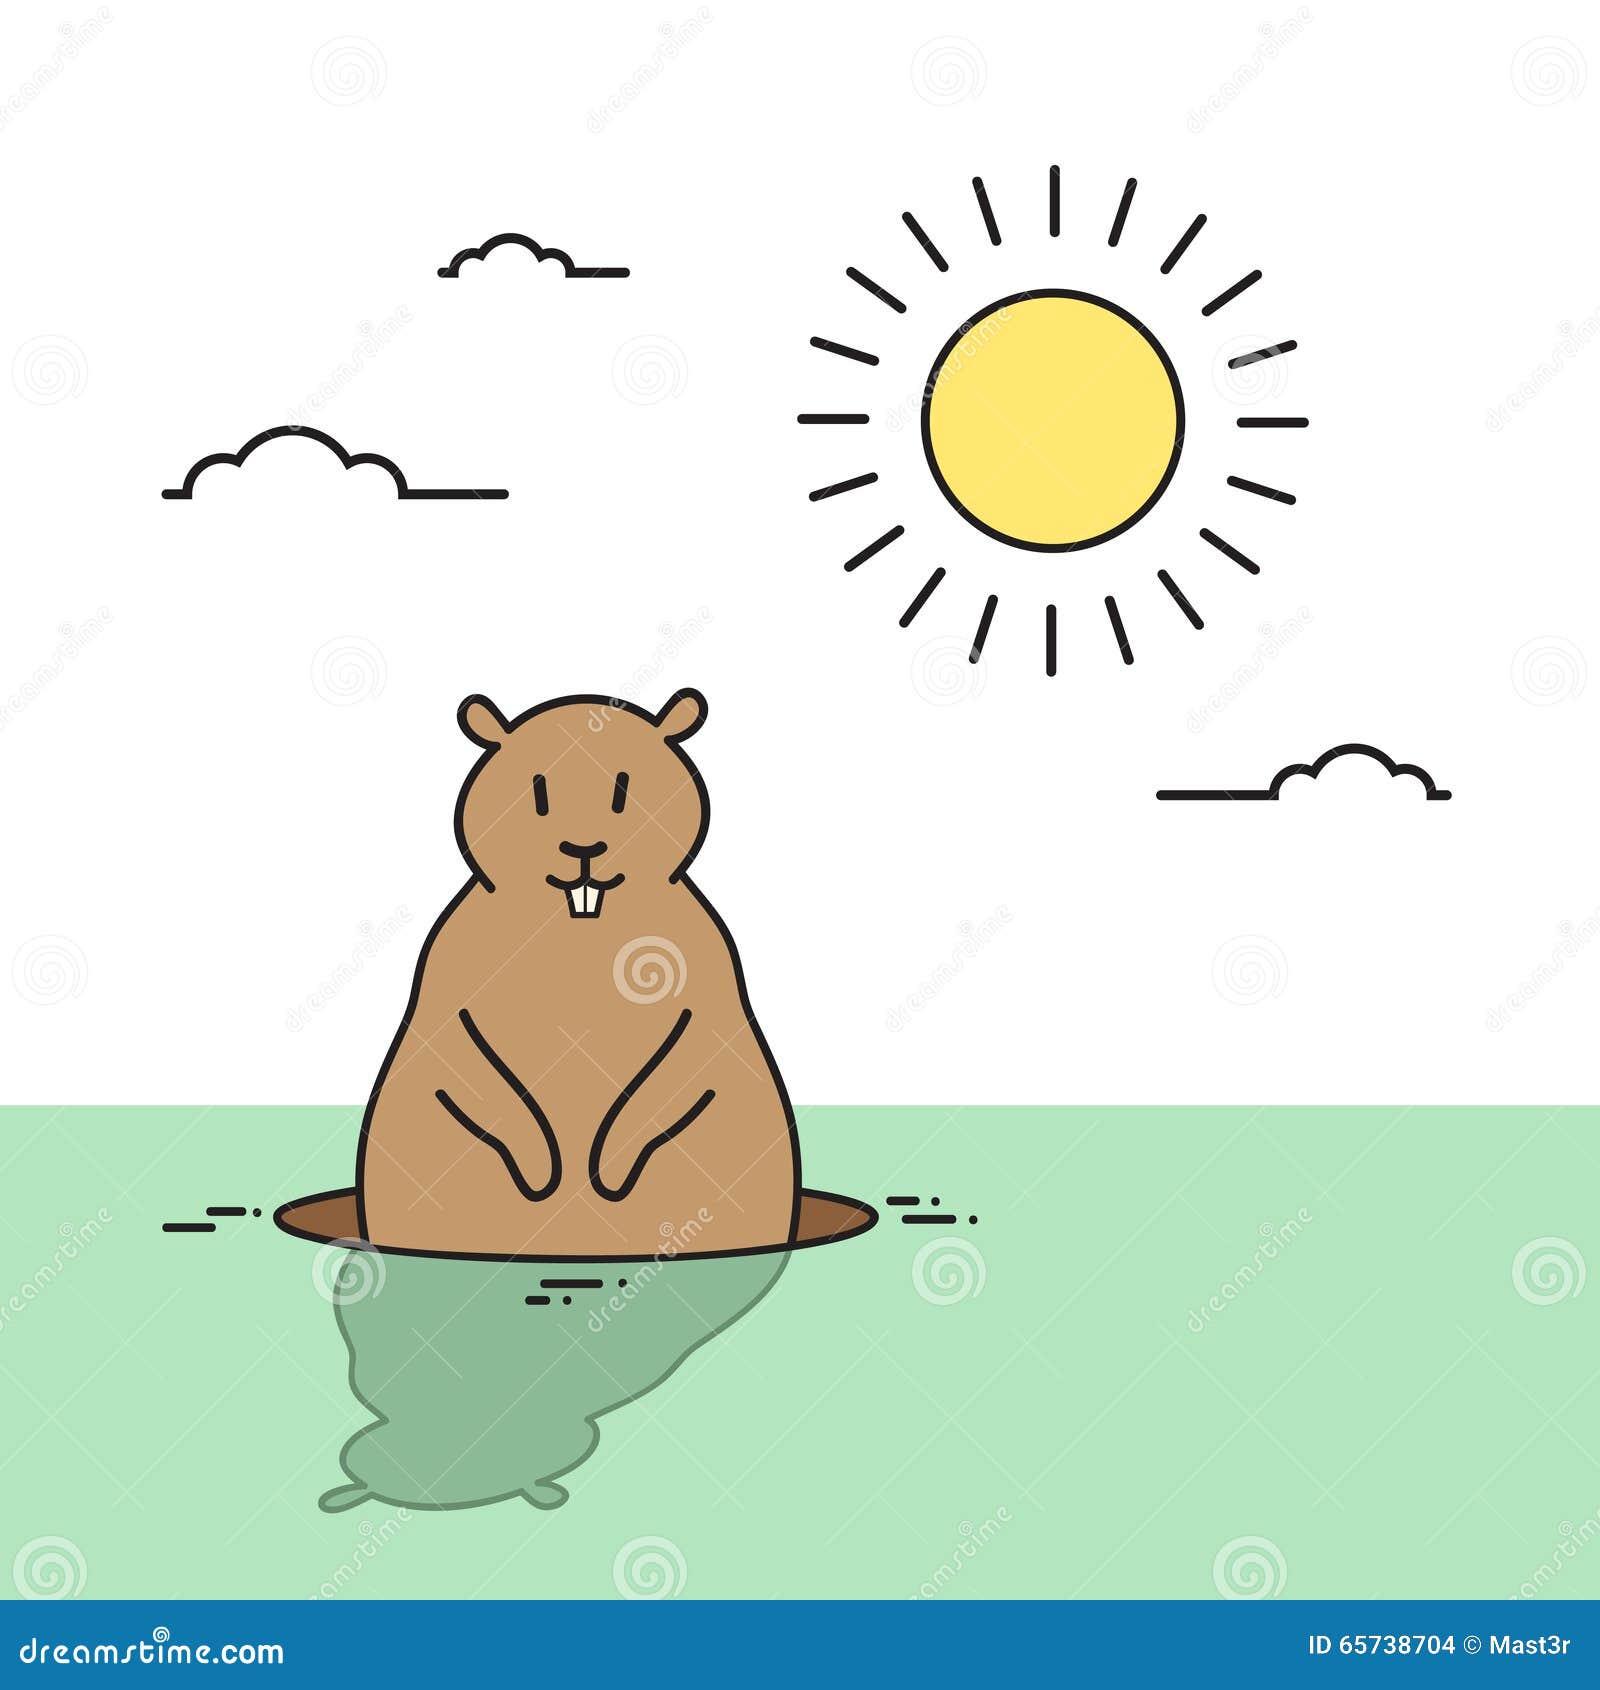 groundhog day animal wake up spring holiday stock vector image